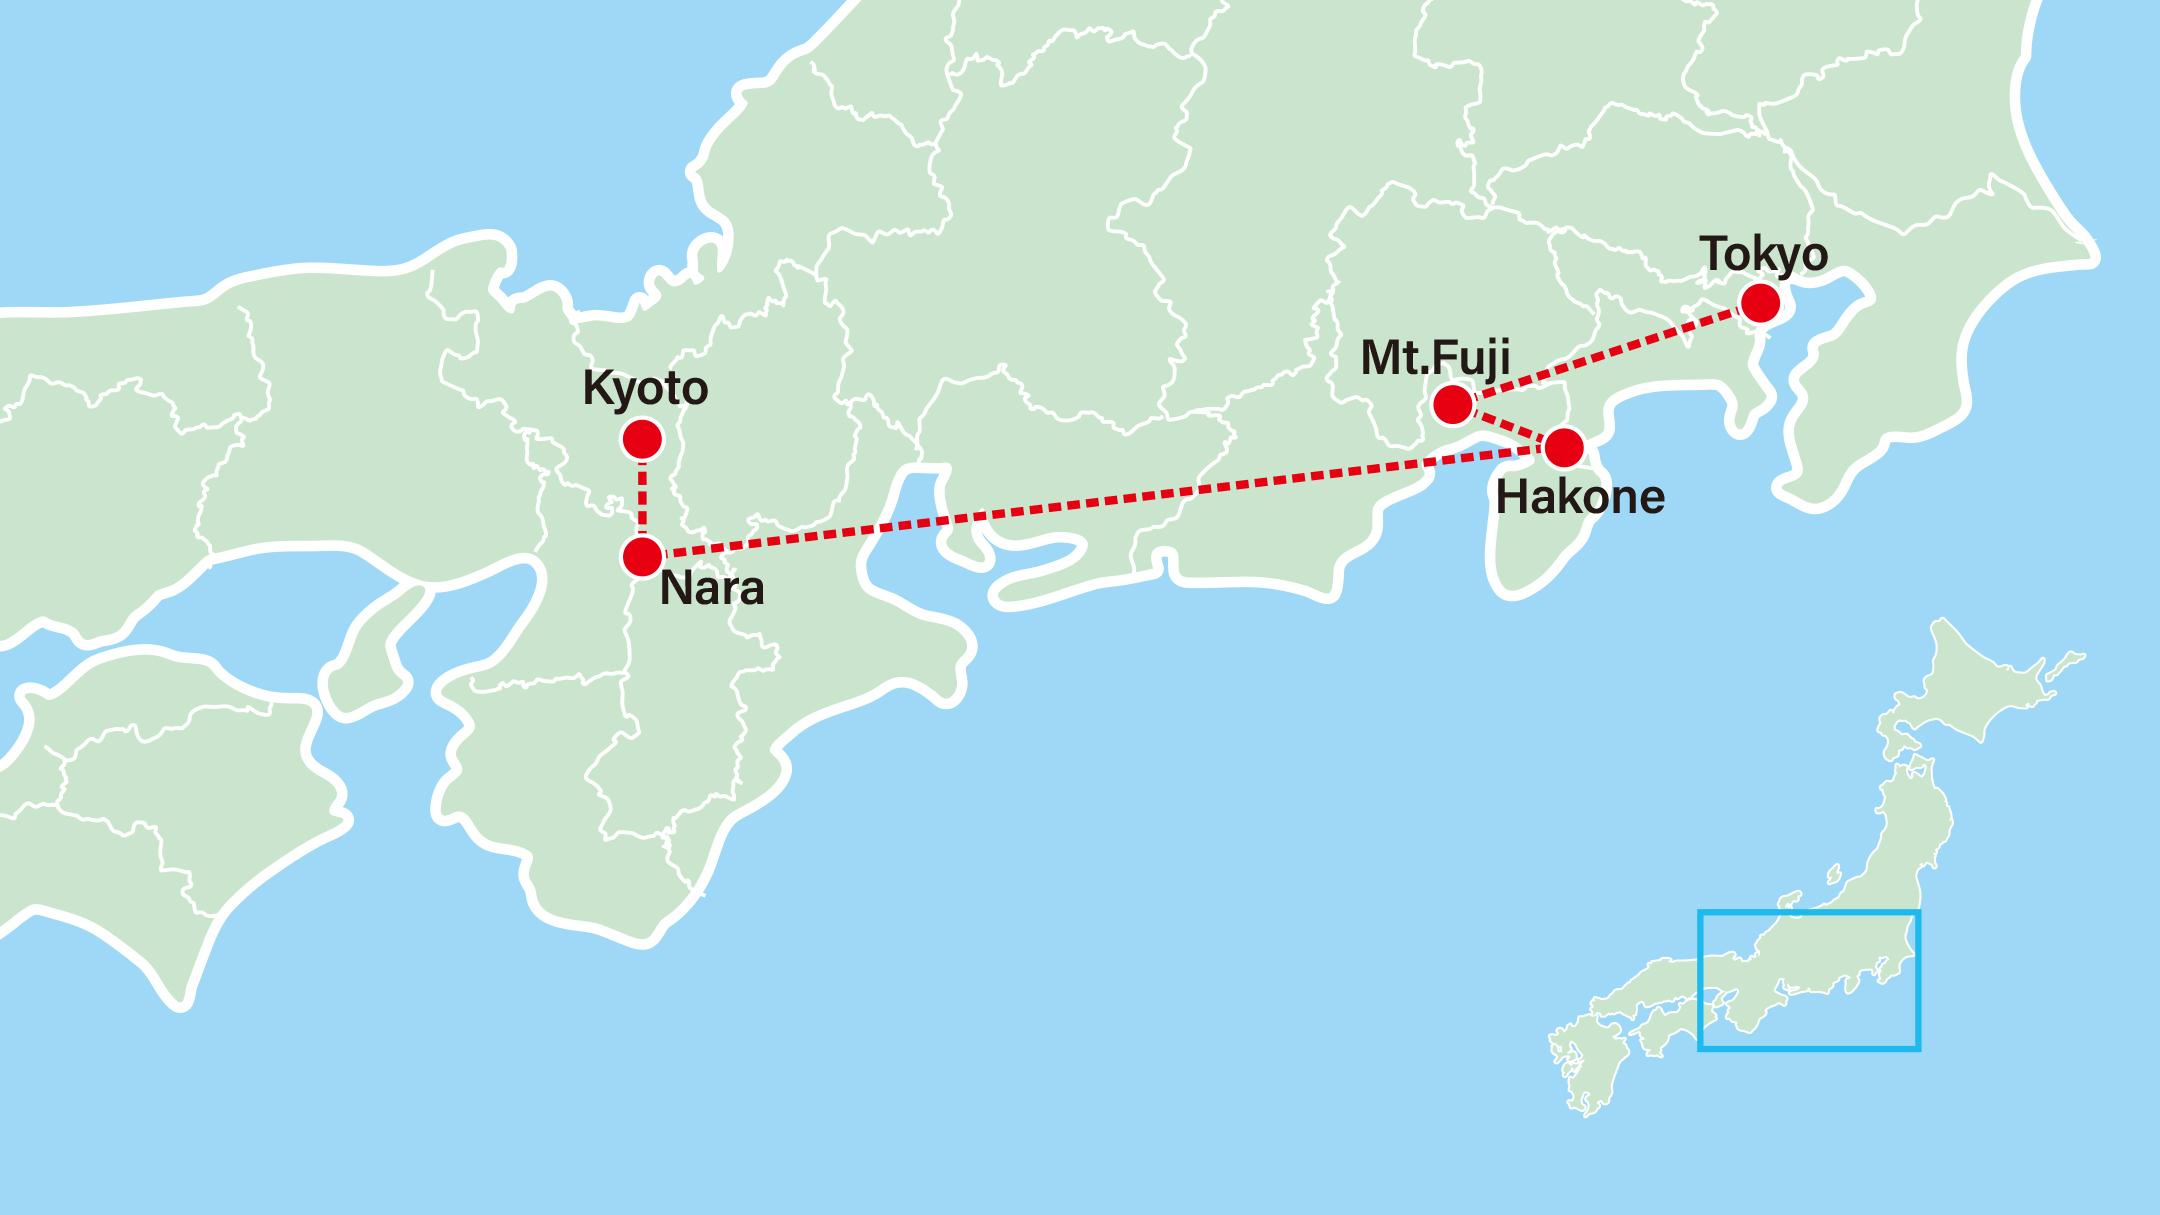 Golden Route of Japan 7 Days-Nara-Kyoto-Hakone-Mt Fuji-Tokyo-Yokohama